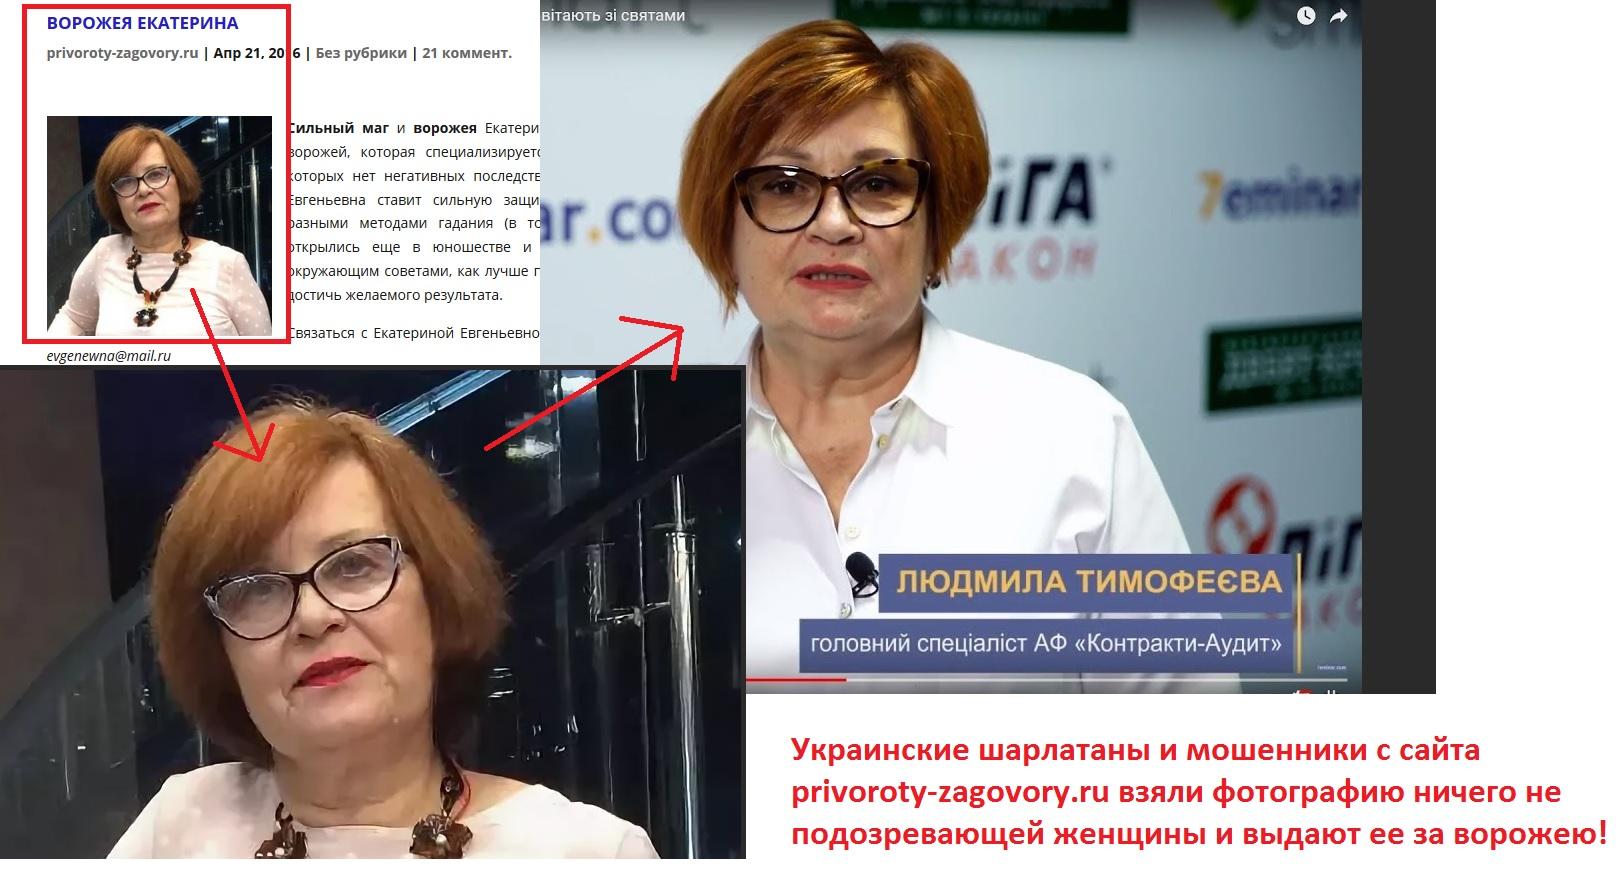 шарлатанка и мошенница ворожея Екатерина ekaterina-evgenewna@mail.ru